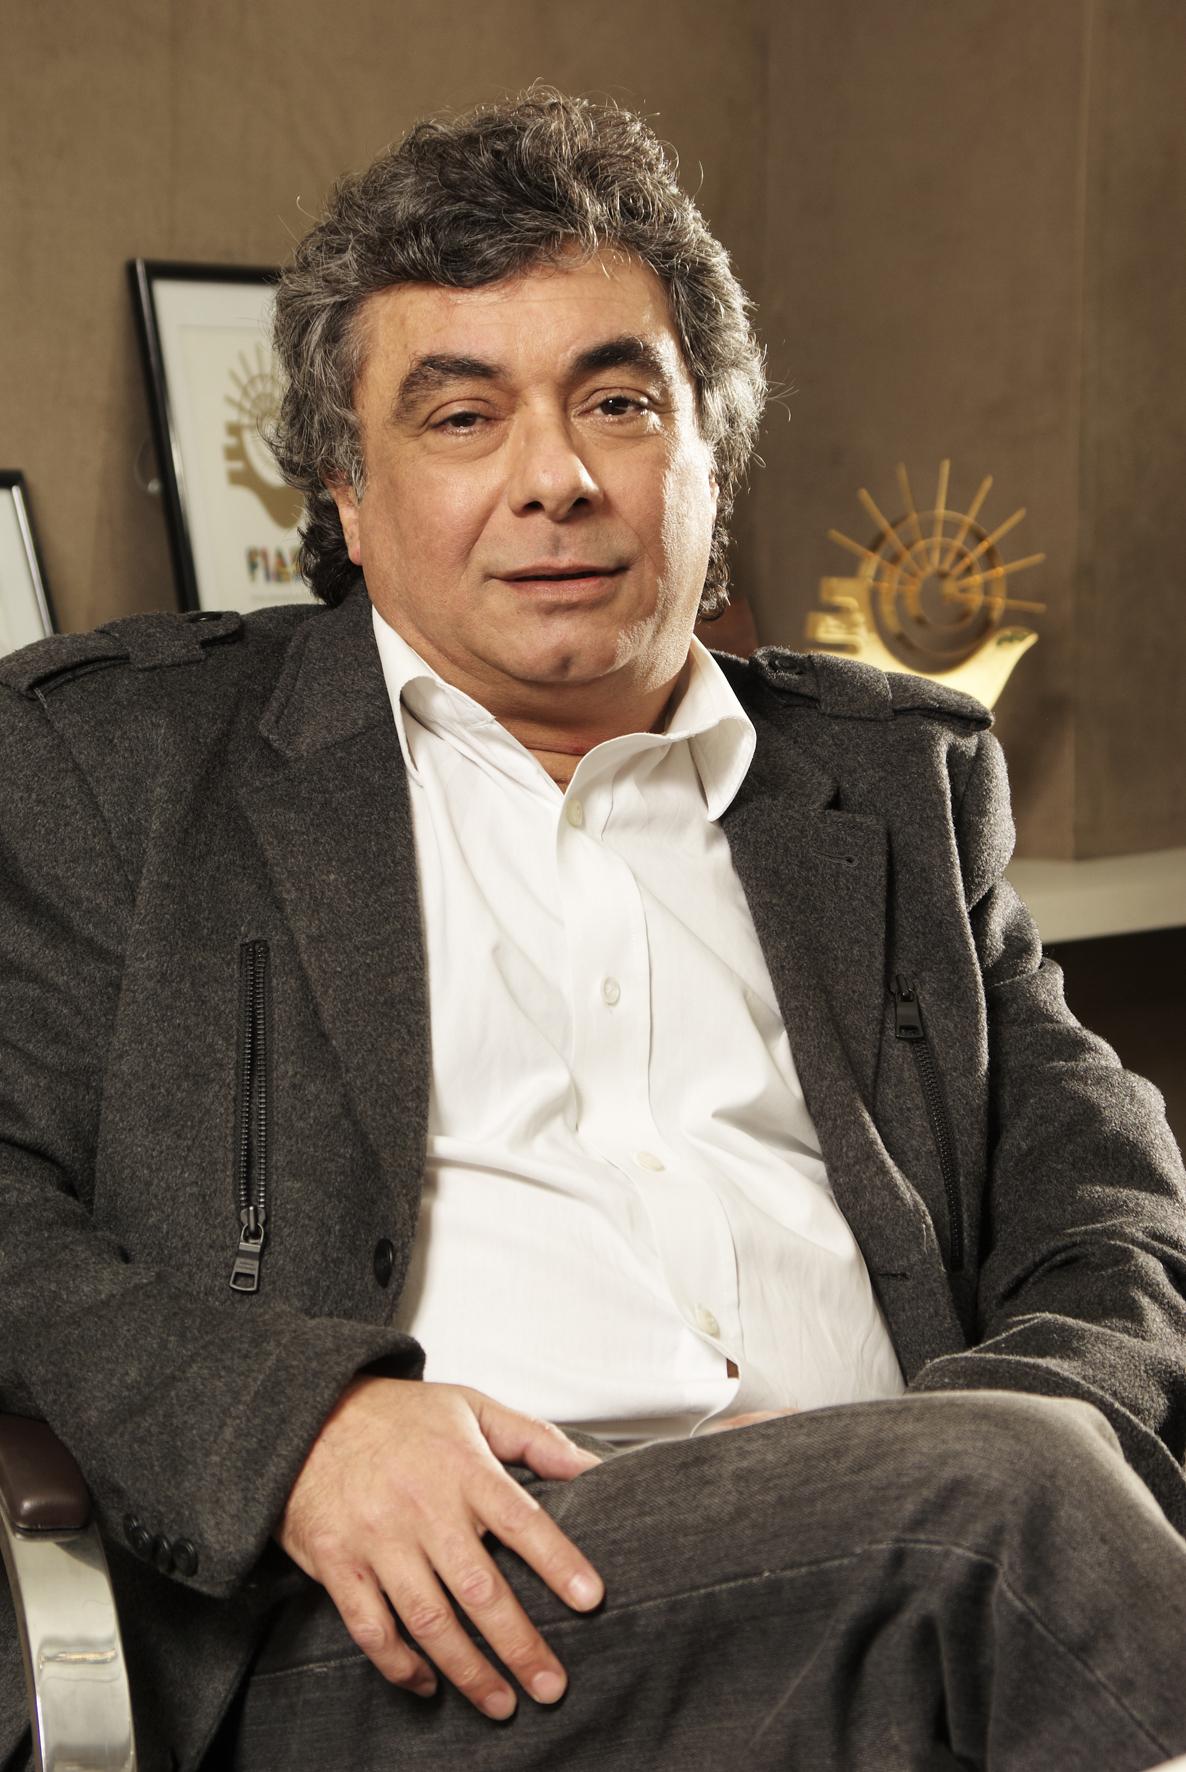 En mindshare argentina c 225 mara argentina de agencias de medios